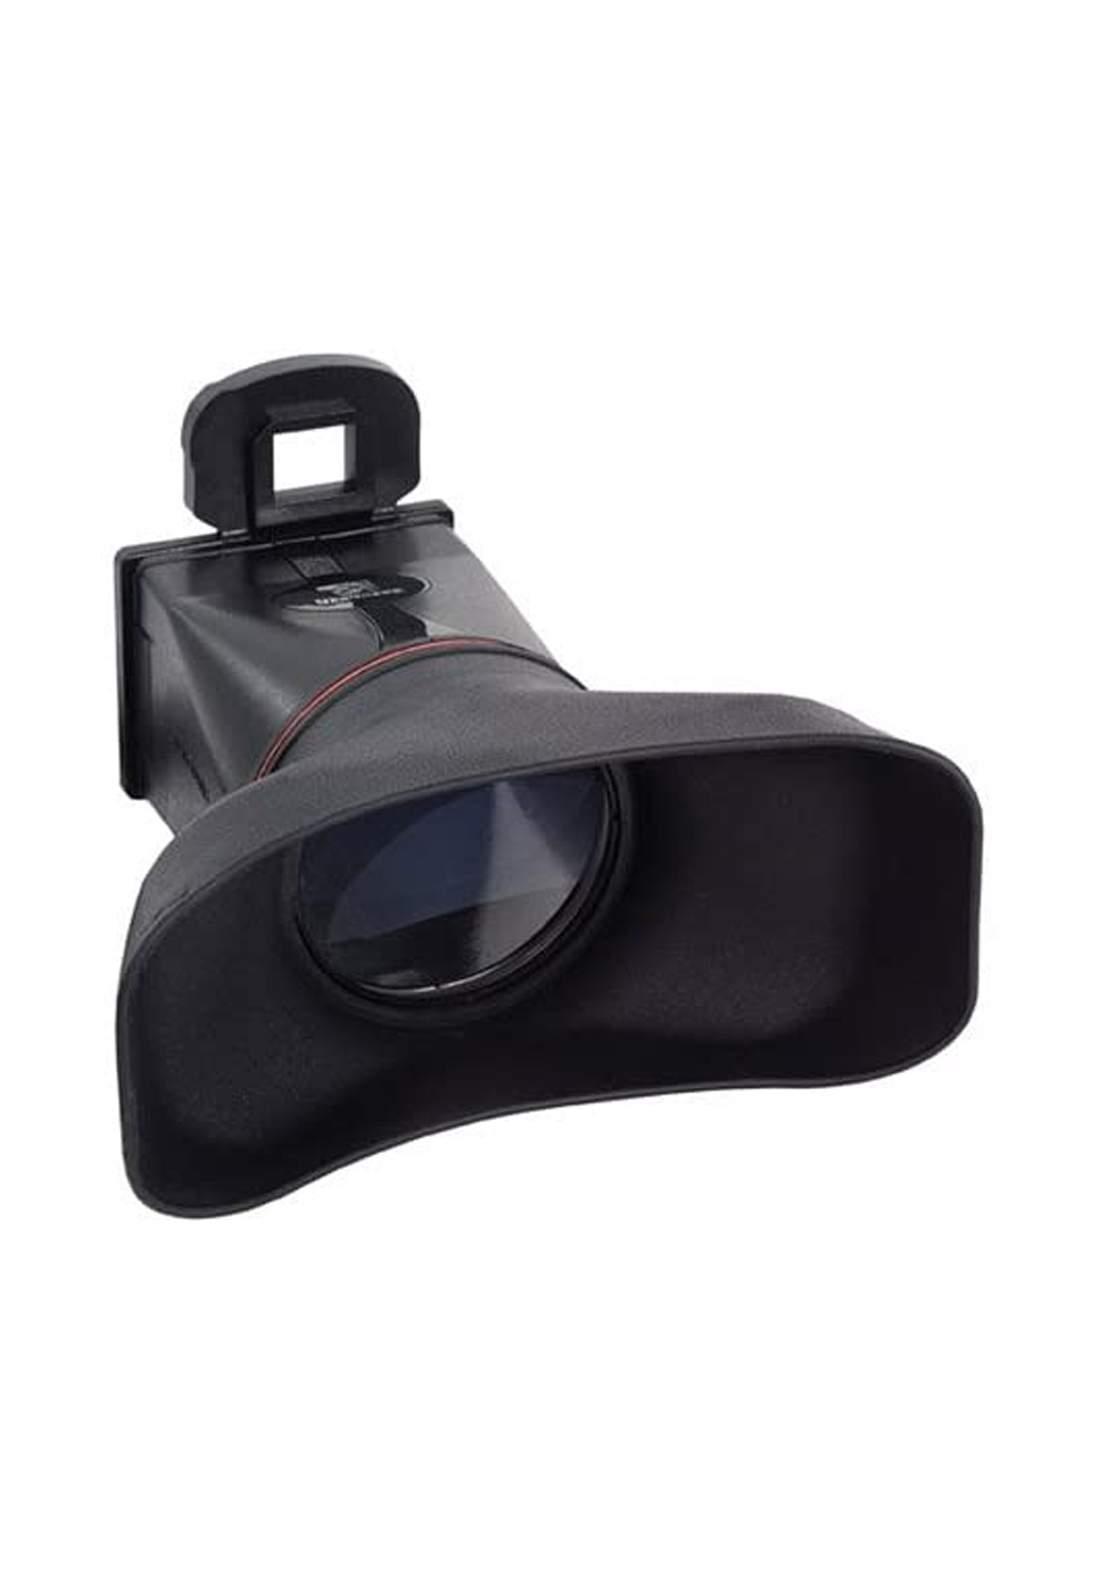 NanGuang CN 278 Dual LCD Display Magnifier Viewfinder for Canon  - Black  عدسة مكبرة للكاميرا